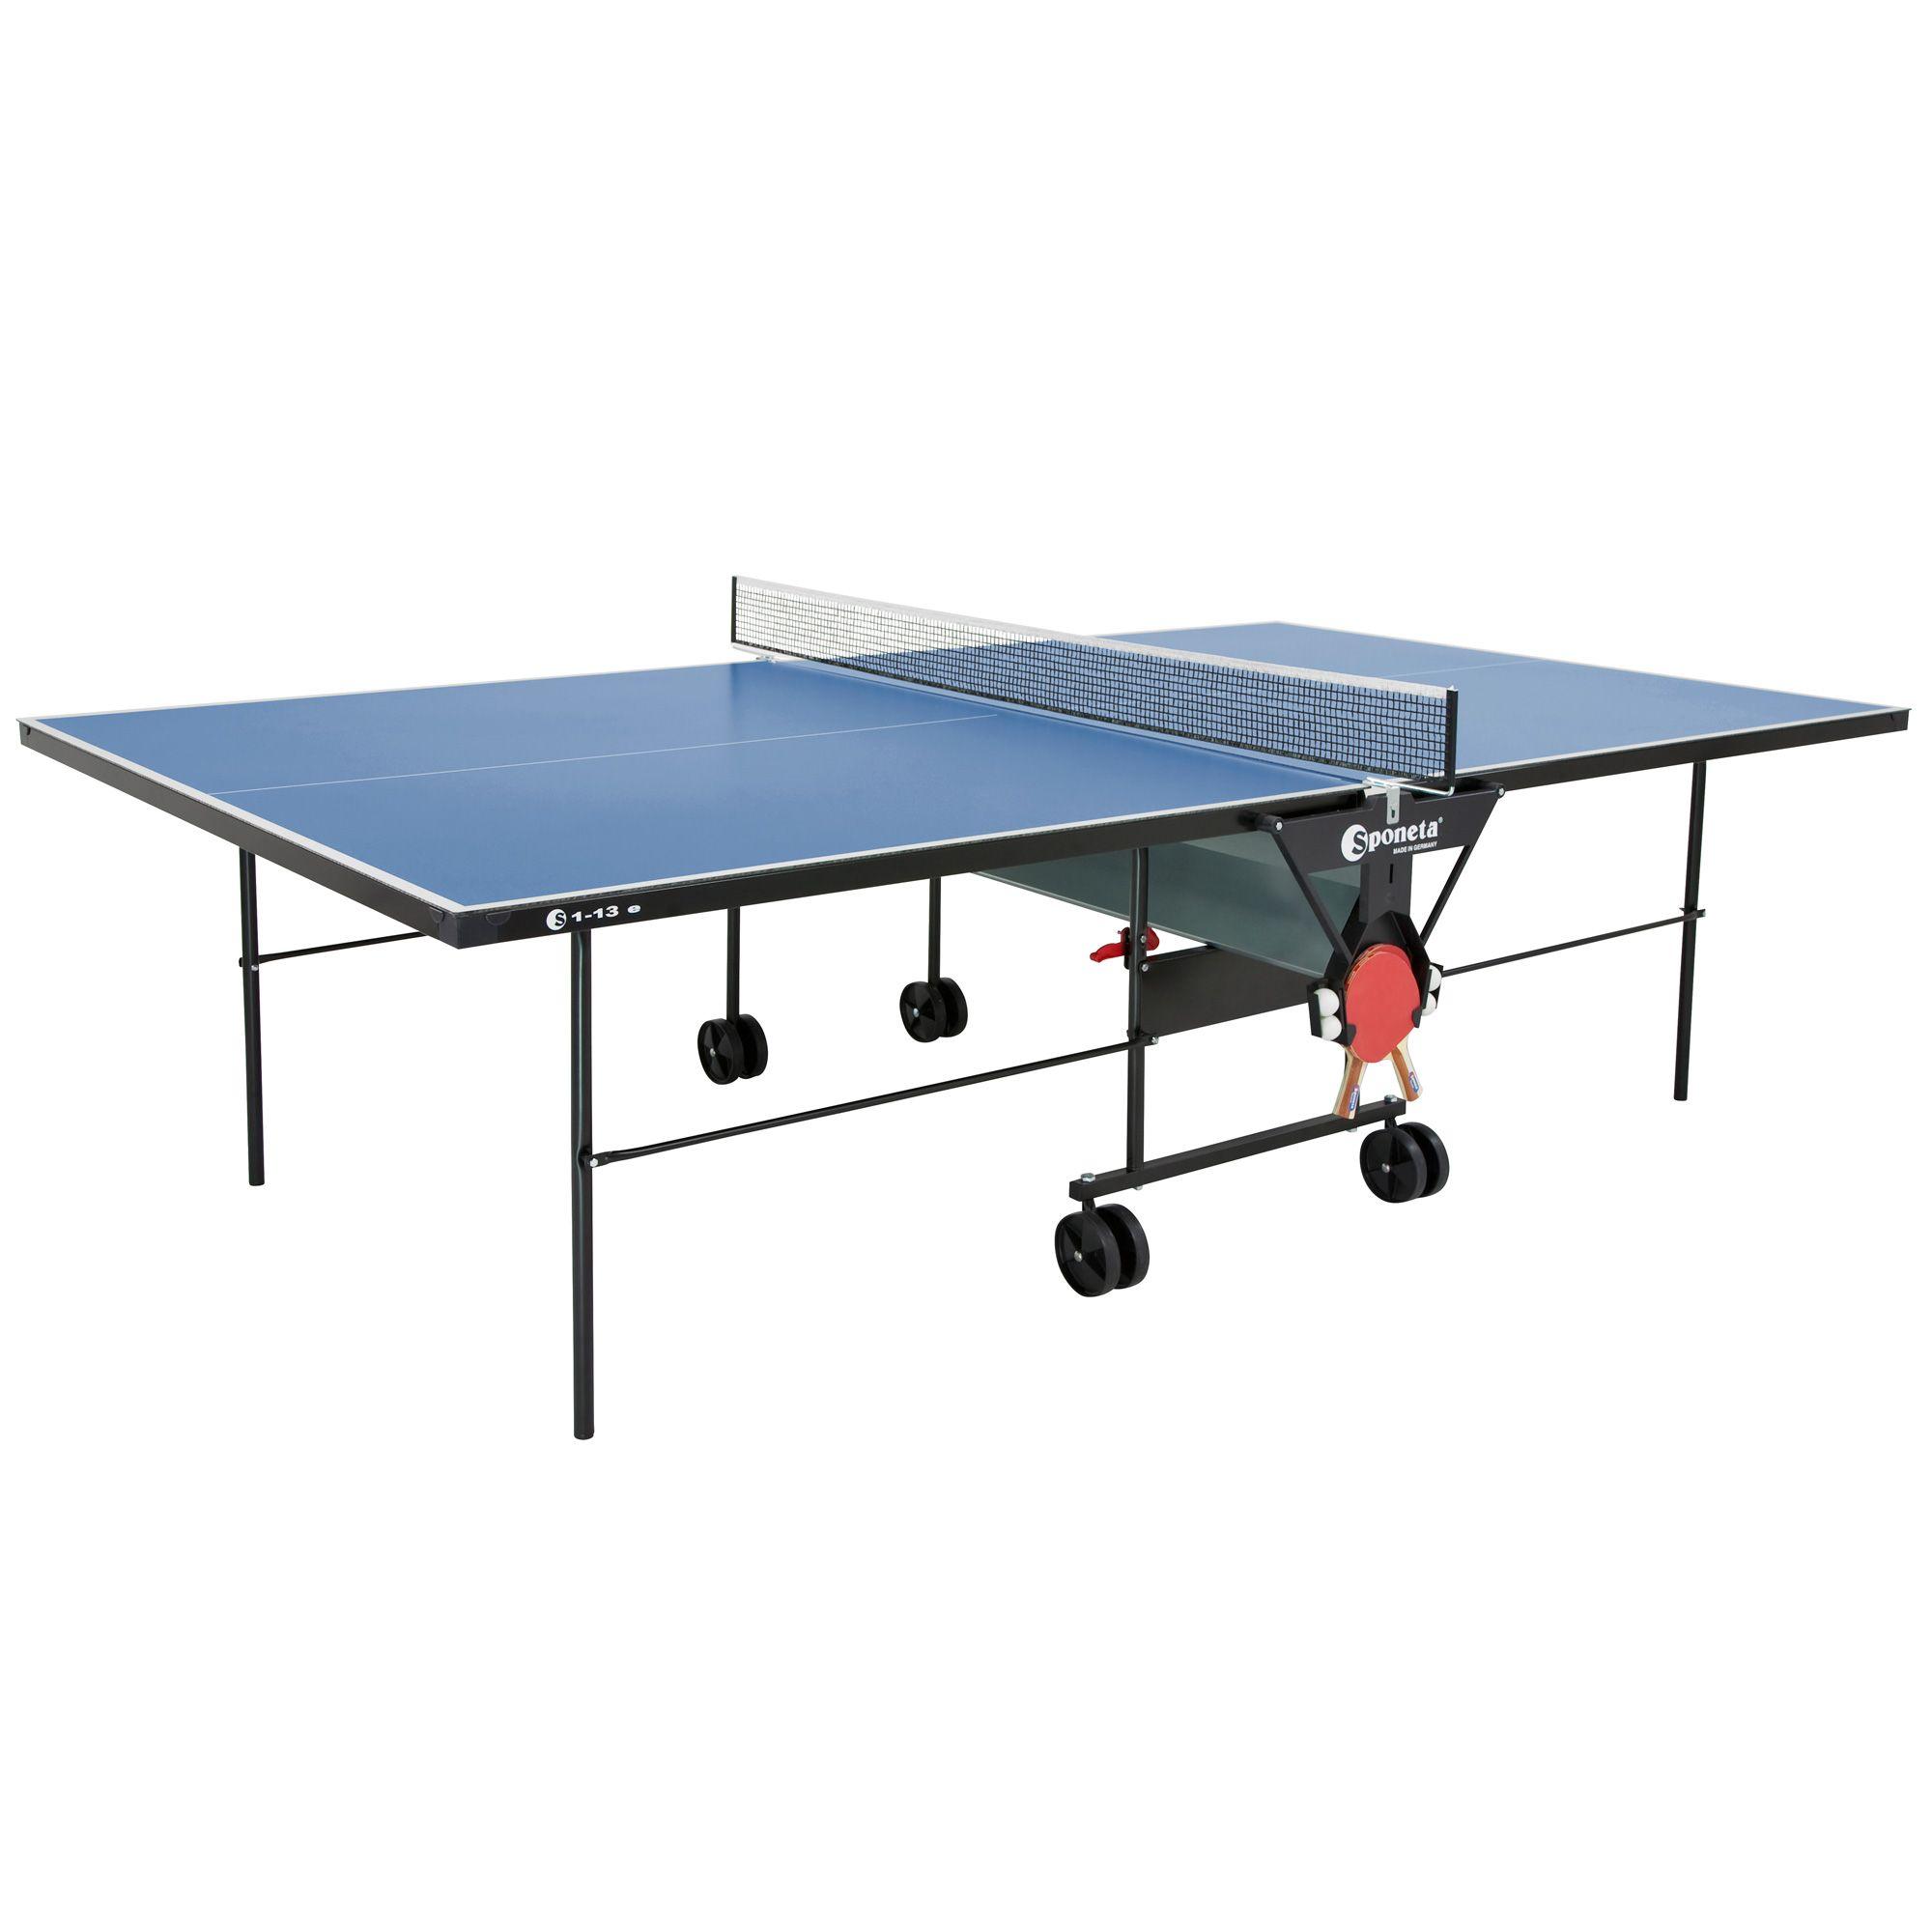 Sponeta hobbyline outdoor table tennis table - Sponeta table tennis table ...